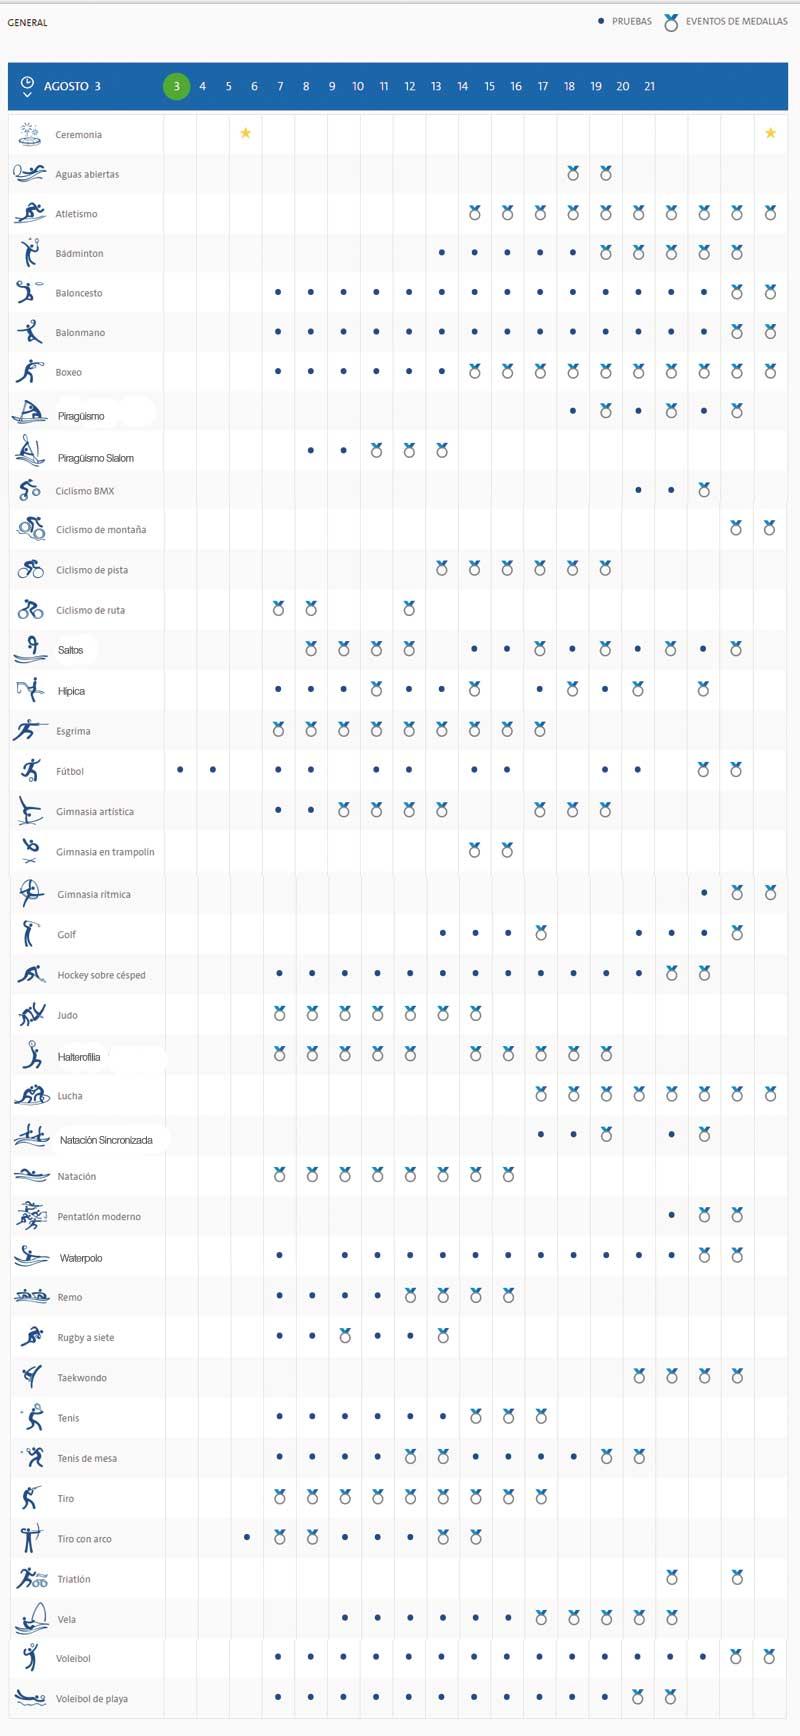 Calendario JJOO Río 2016. Fuente: www.rio2016.com